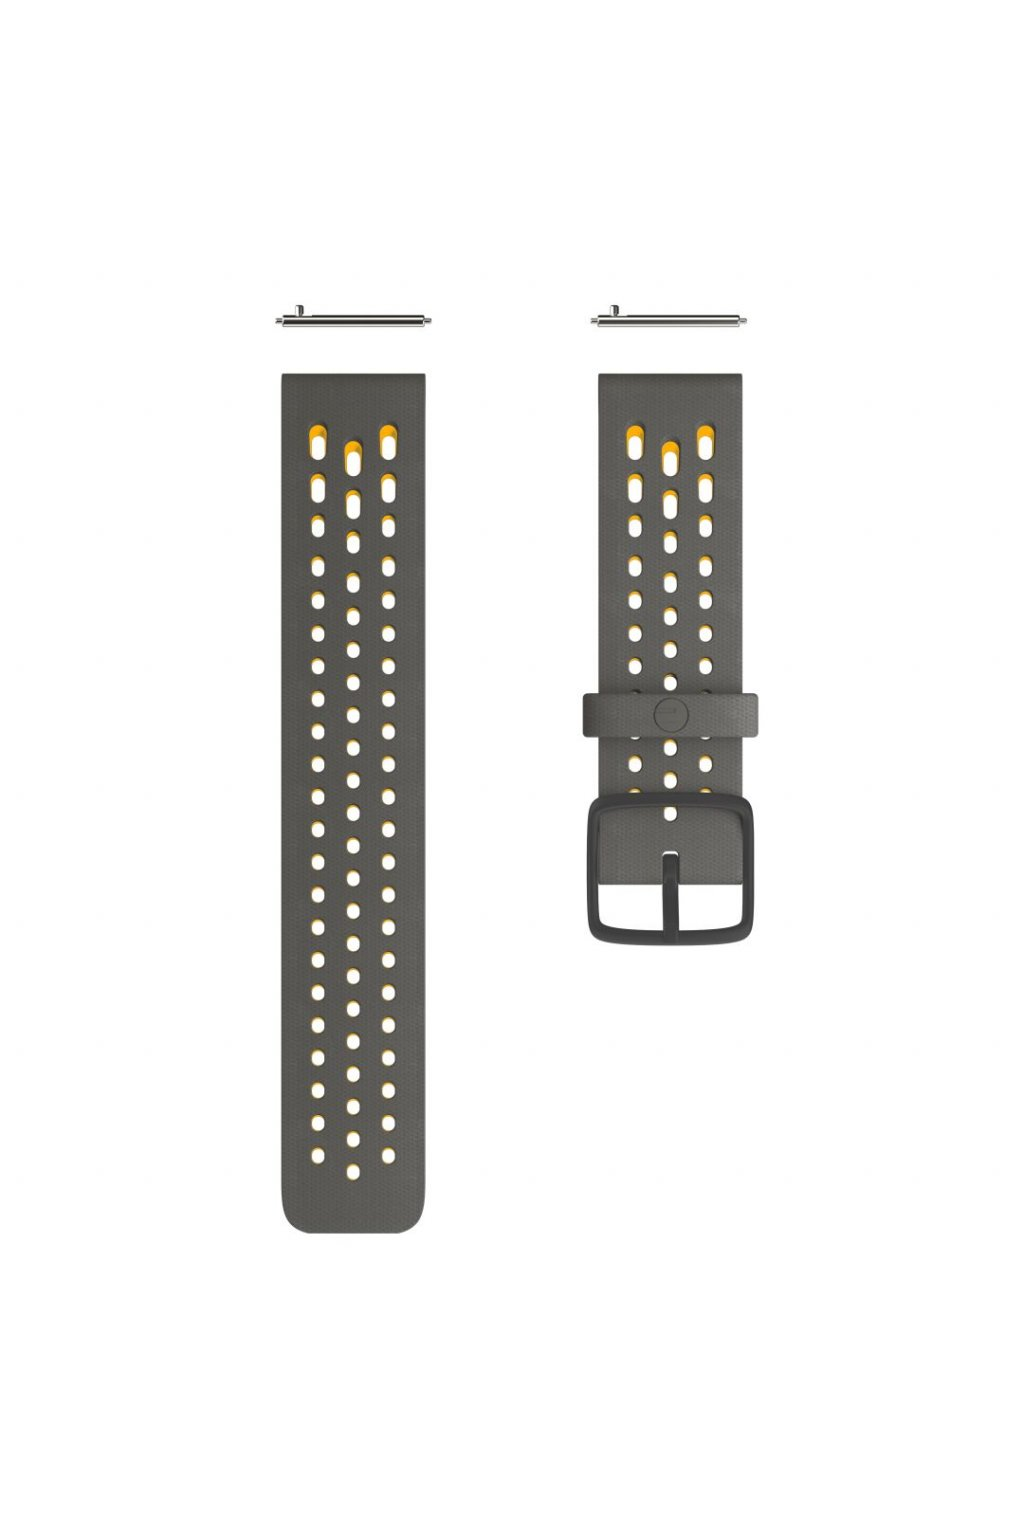 Polar Vantage M2 Accessory wristband front Gun Grey